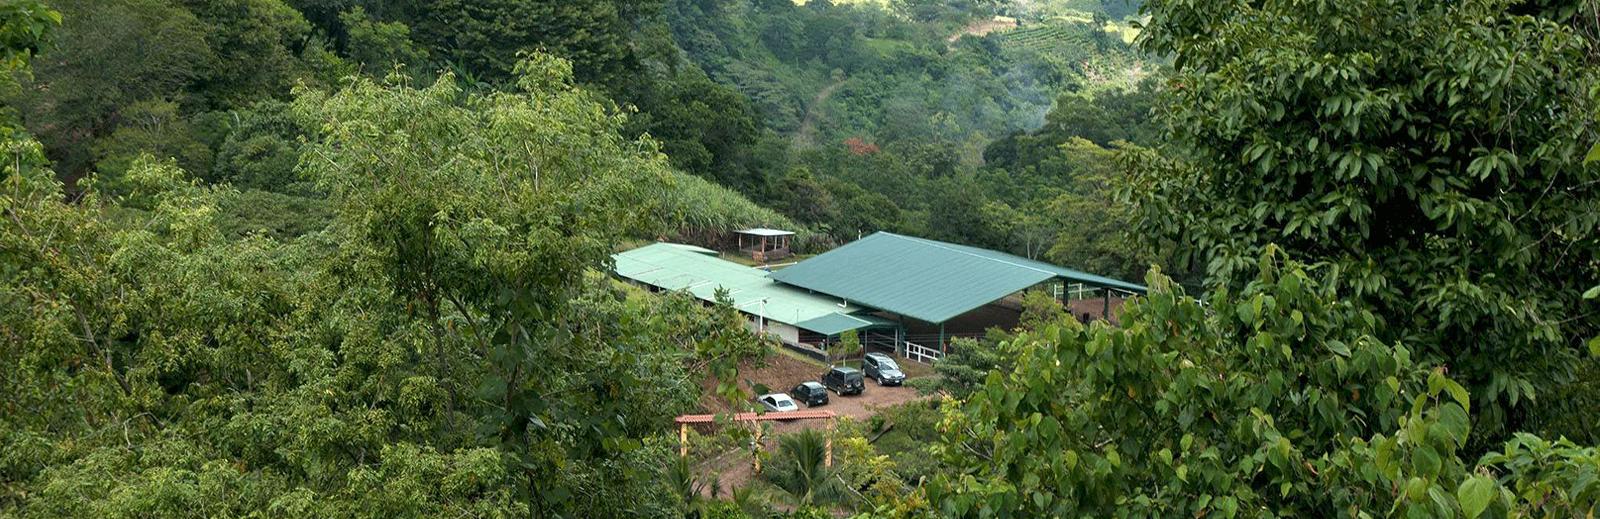 vegetacion-andares-caballos